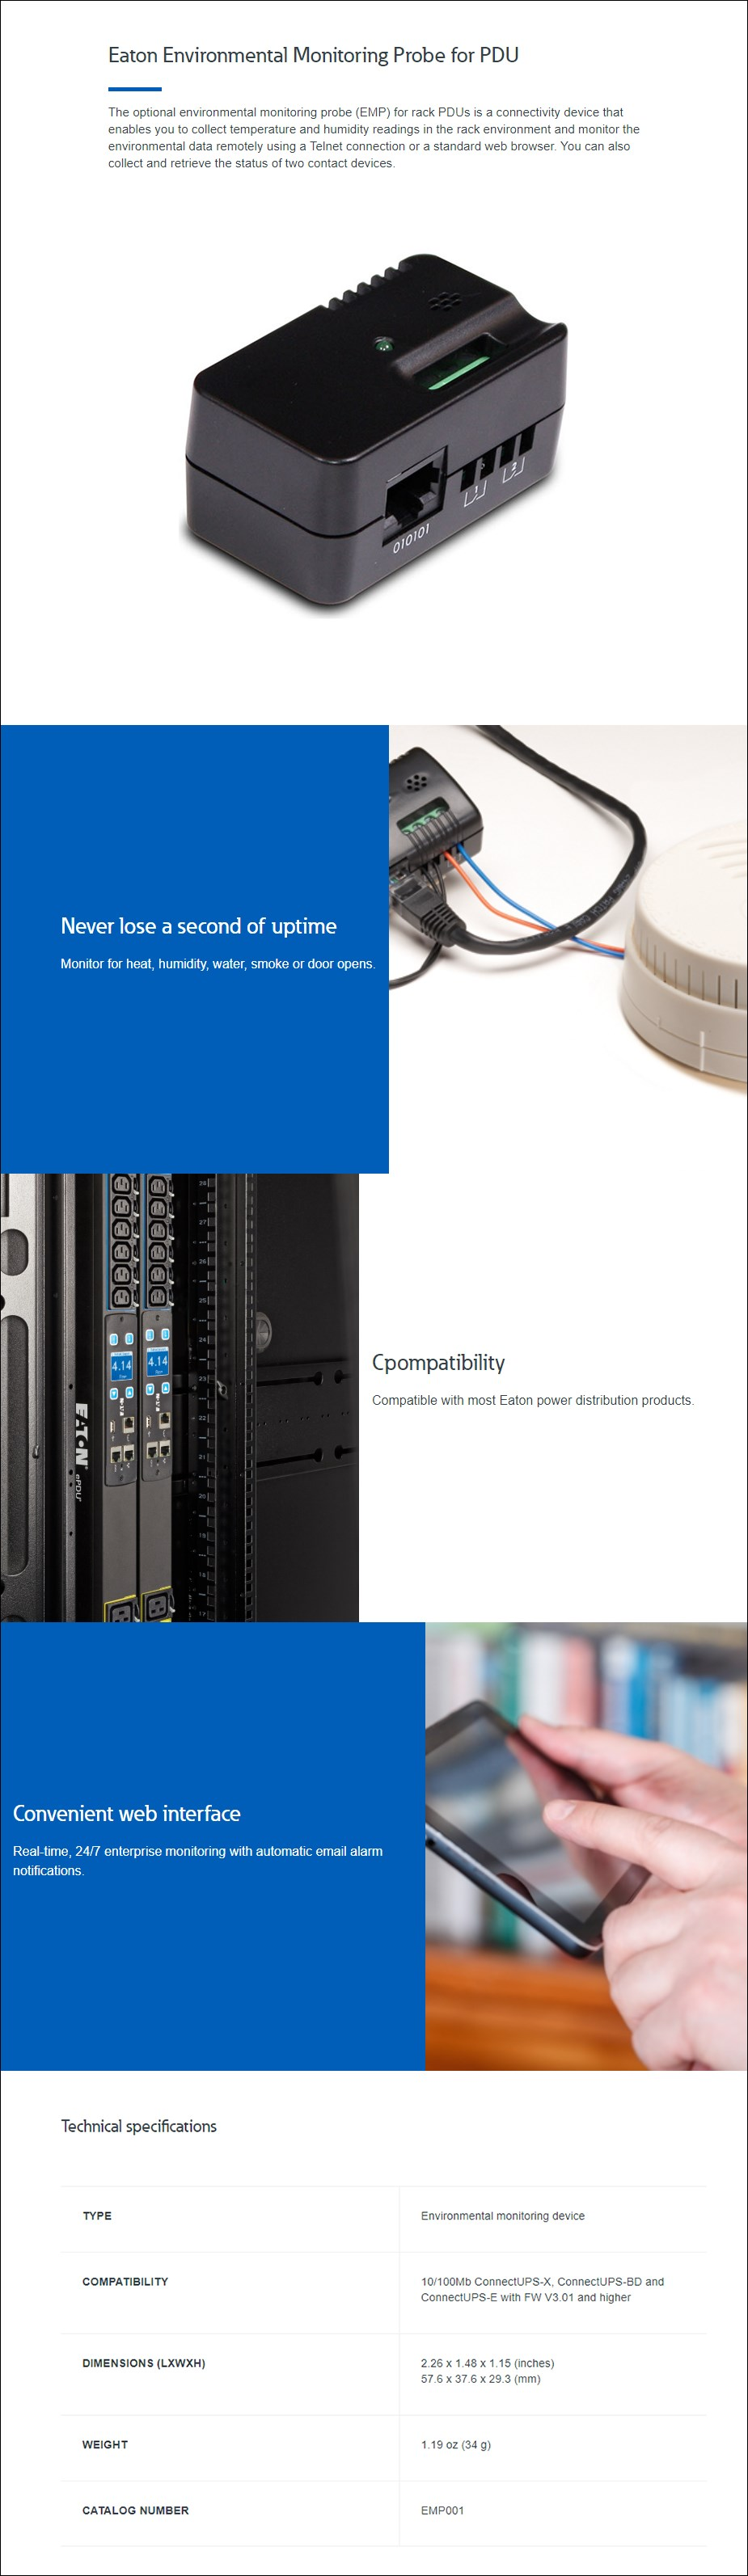 Eaton EMP001 Environmental Monitoring Probe - Overview 1